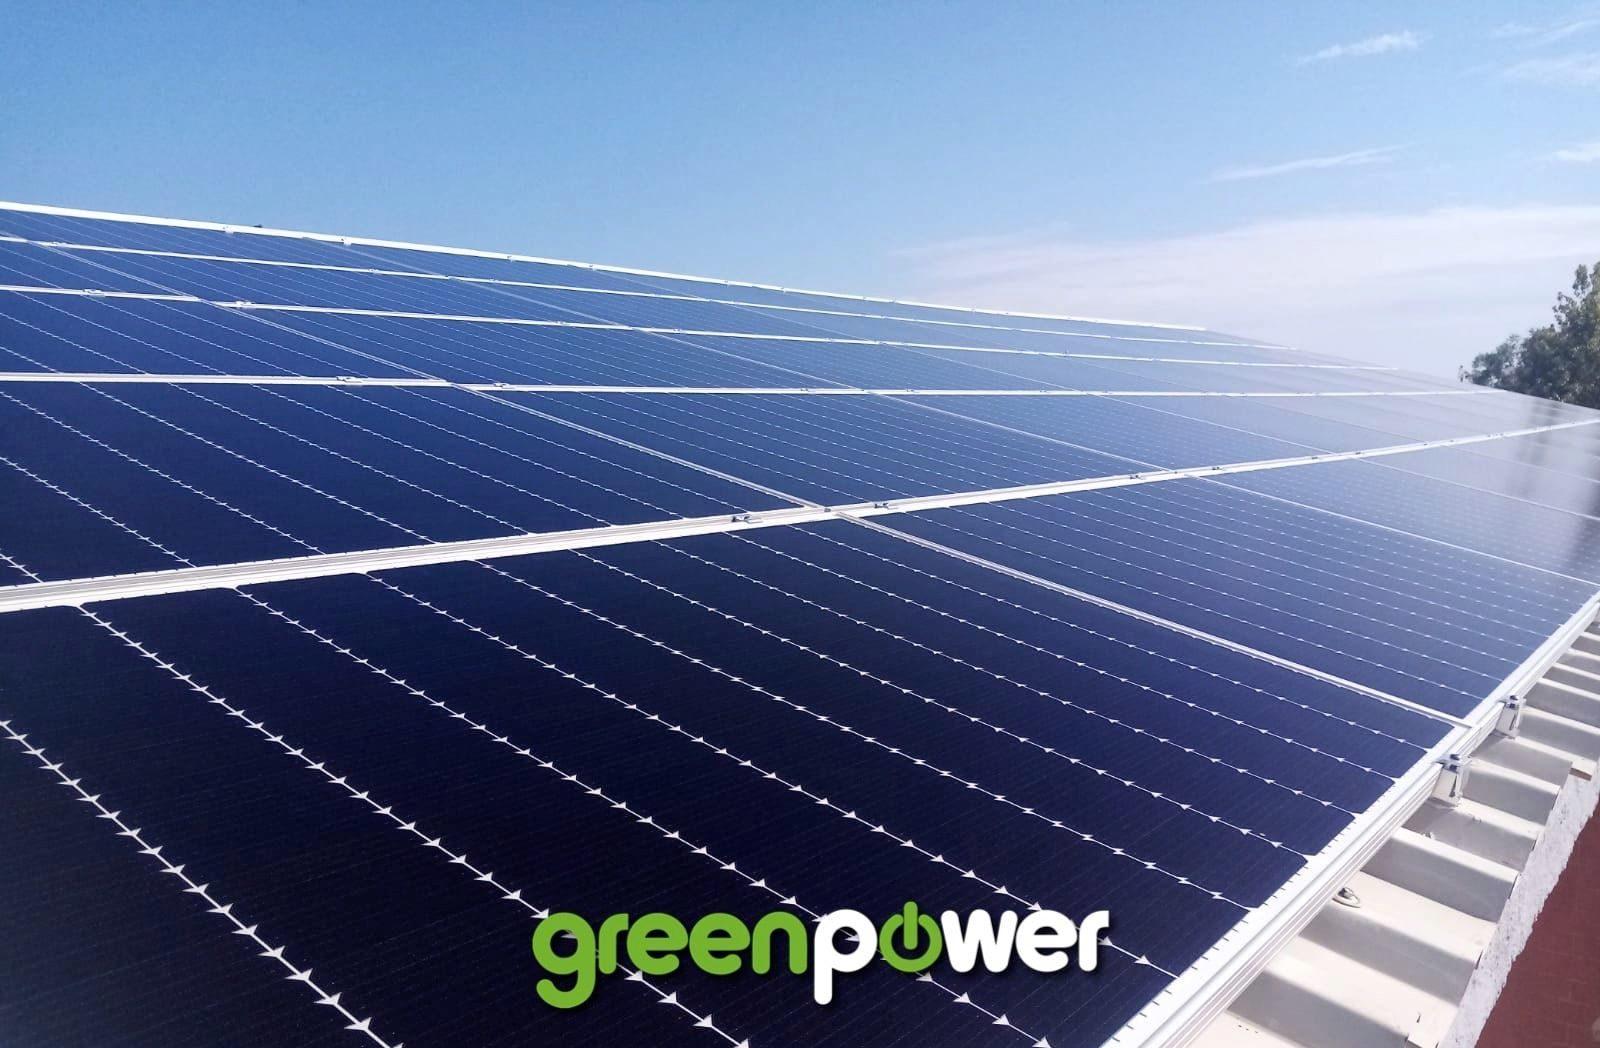 Vendere Energia Elettrica Da Fotovoltaico impianto fotovoltaico - green power energia